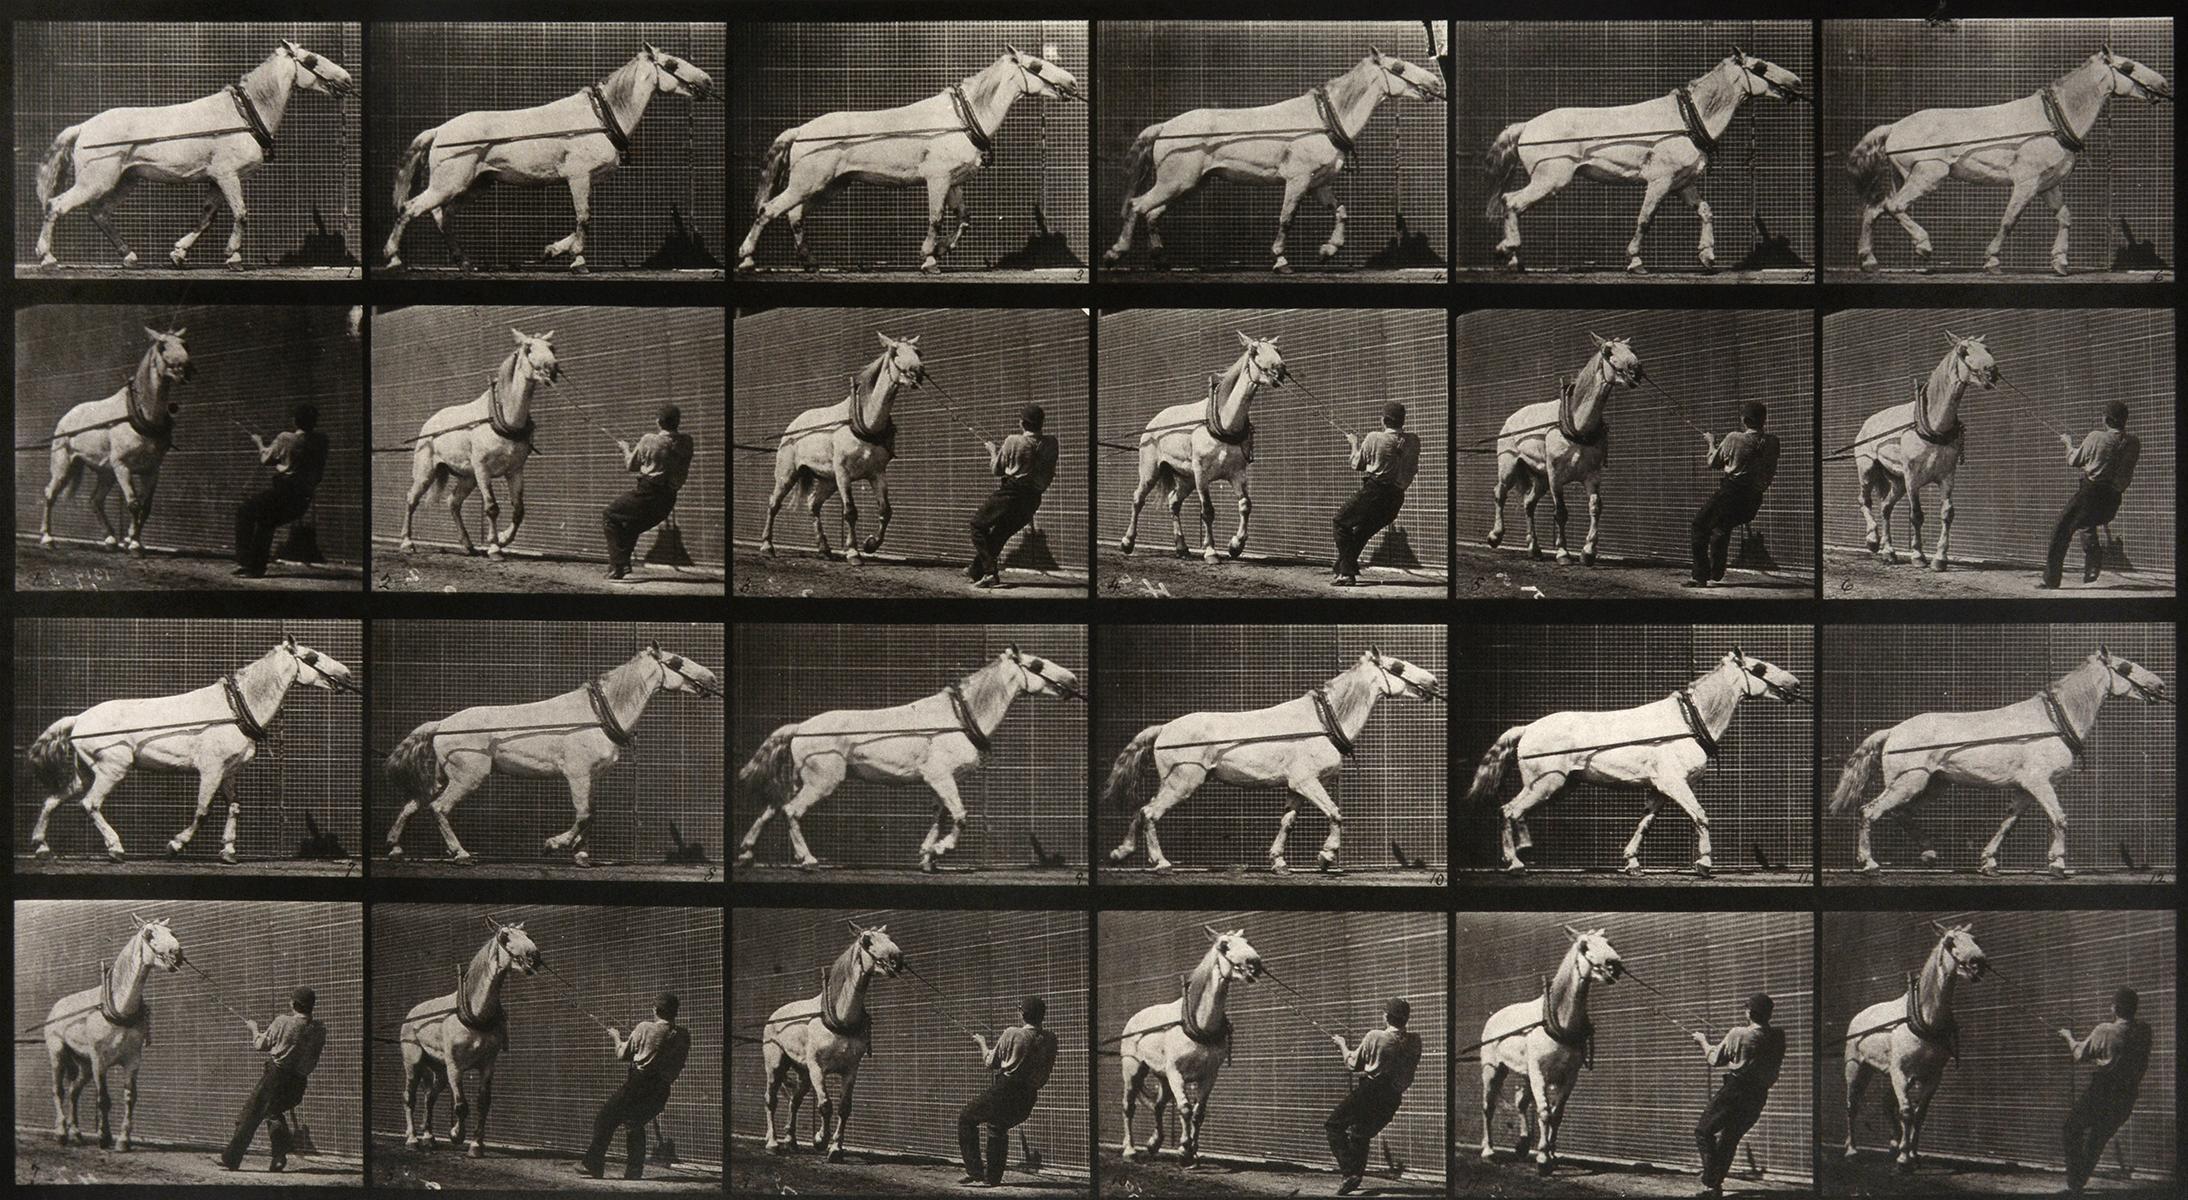 Animal Locomotion: Plate 573 (Man Pulling Horse By Reins), 1887 - Muybridge